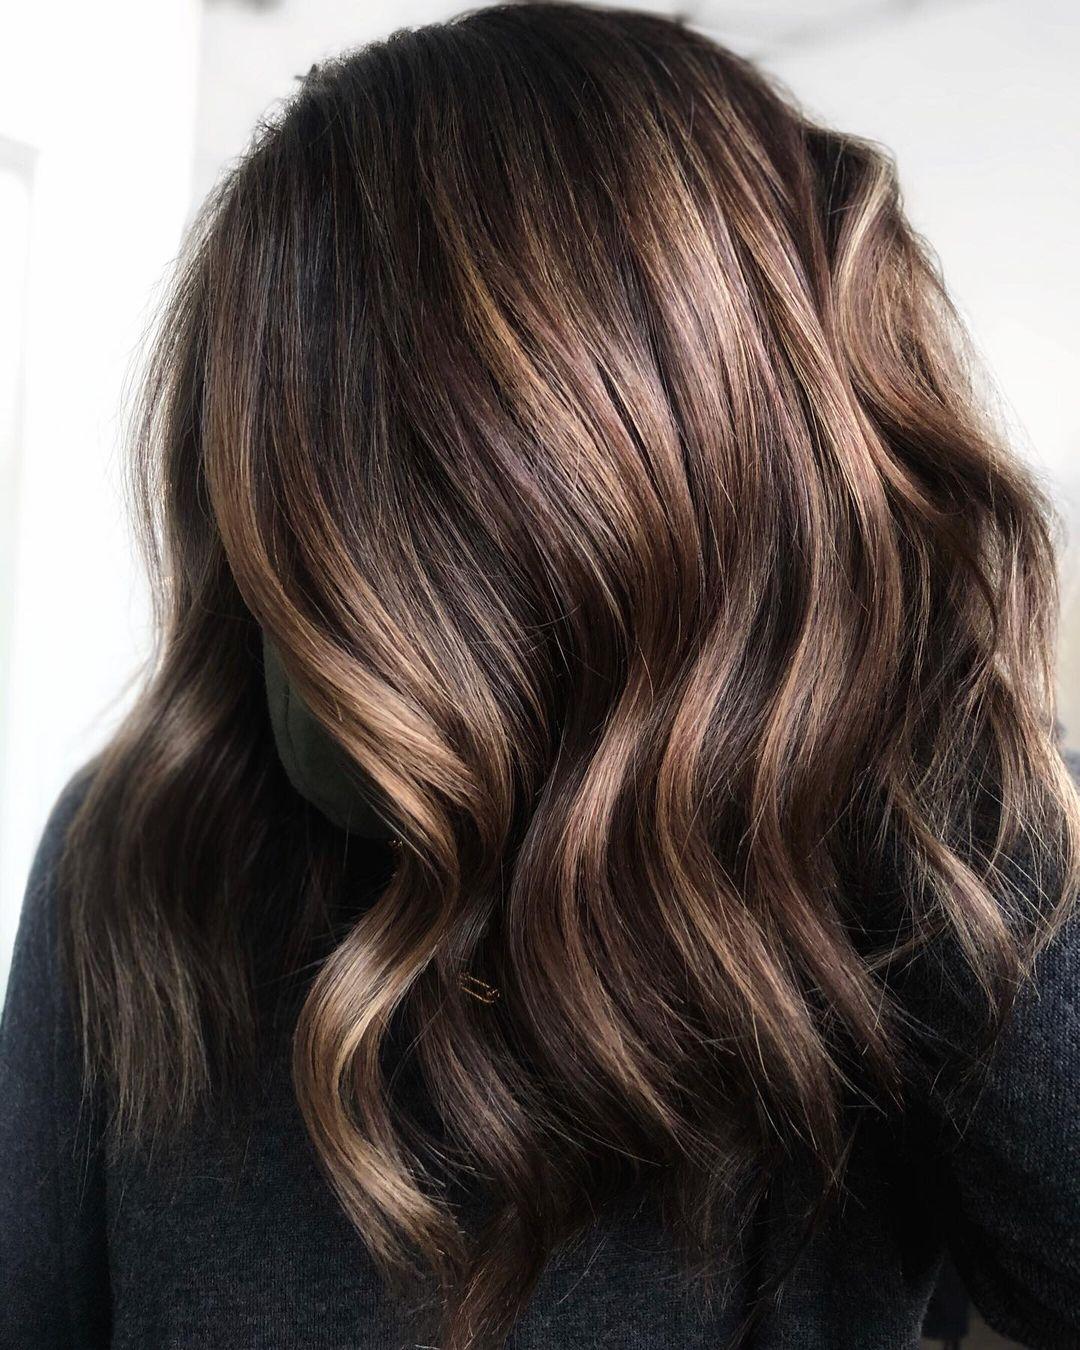 Dark Brown Hair with Bronze Highlights